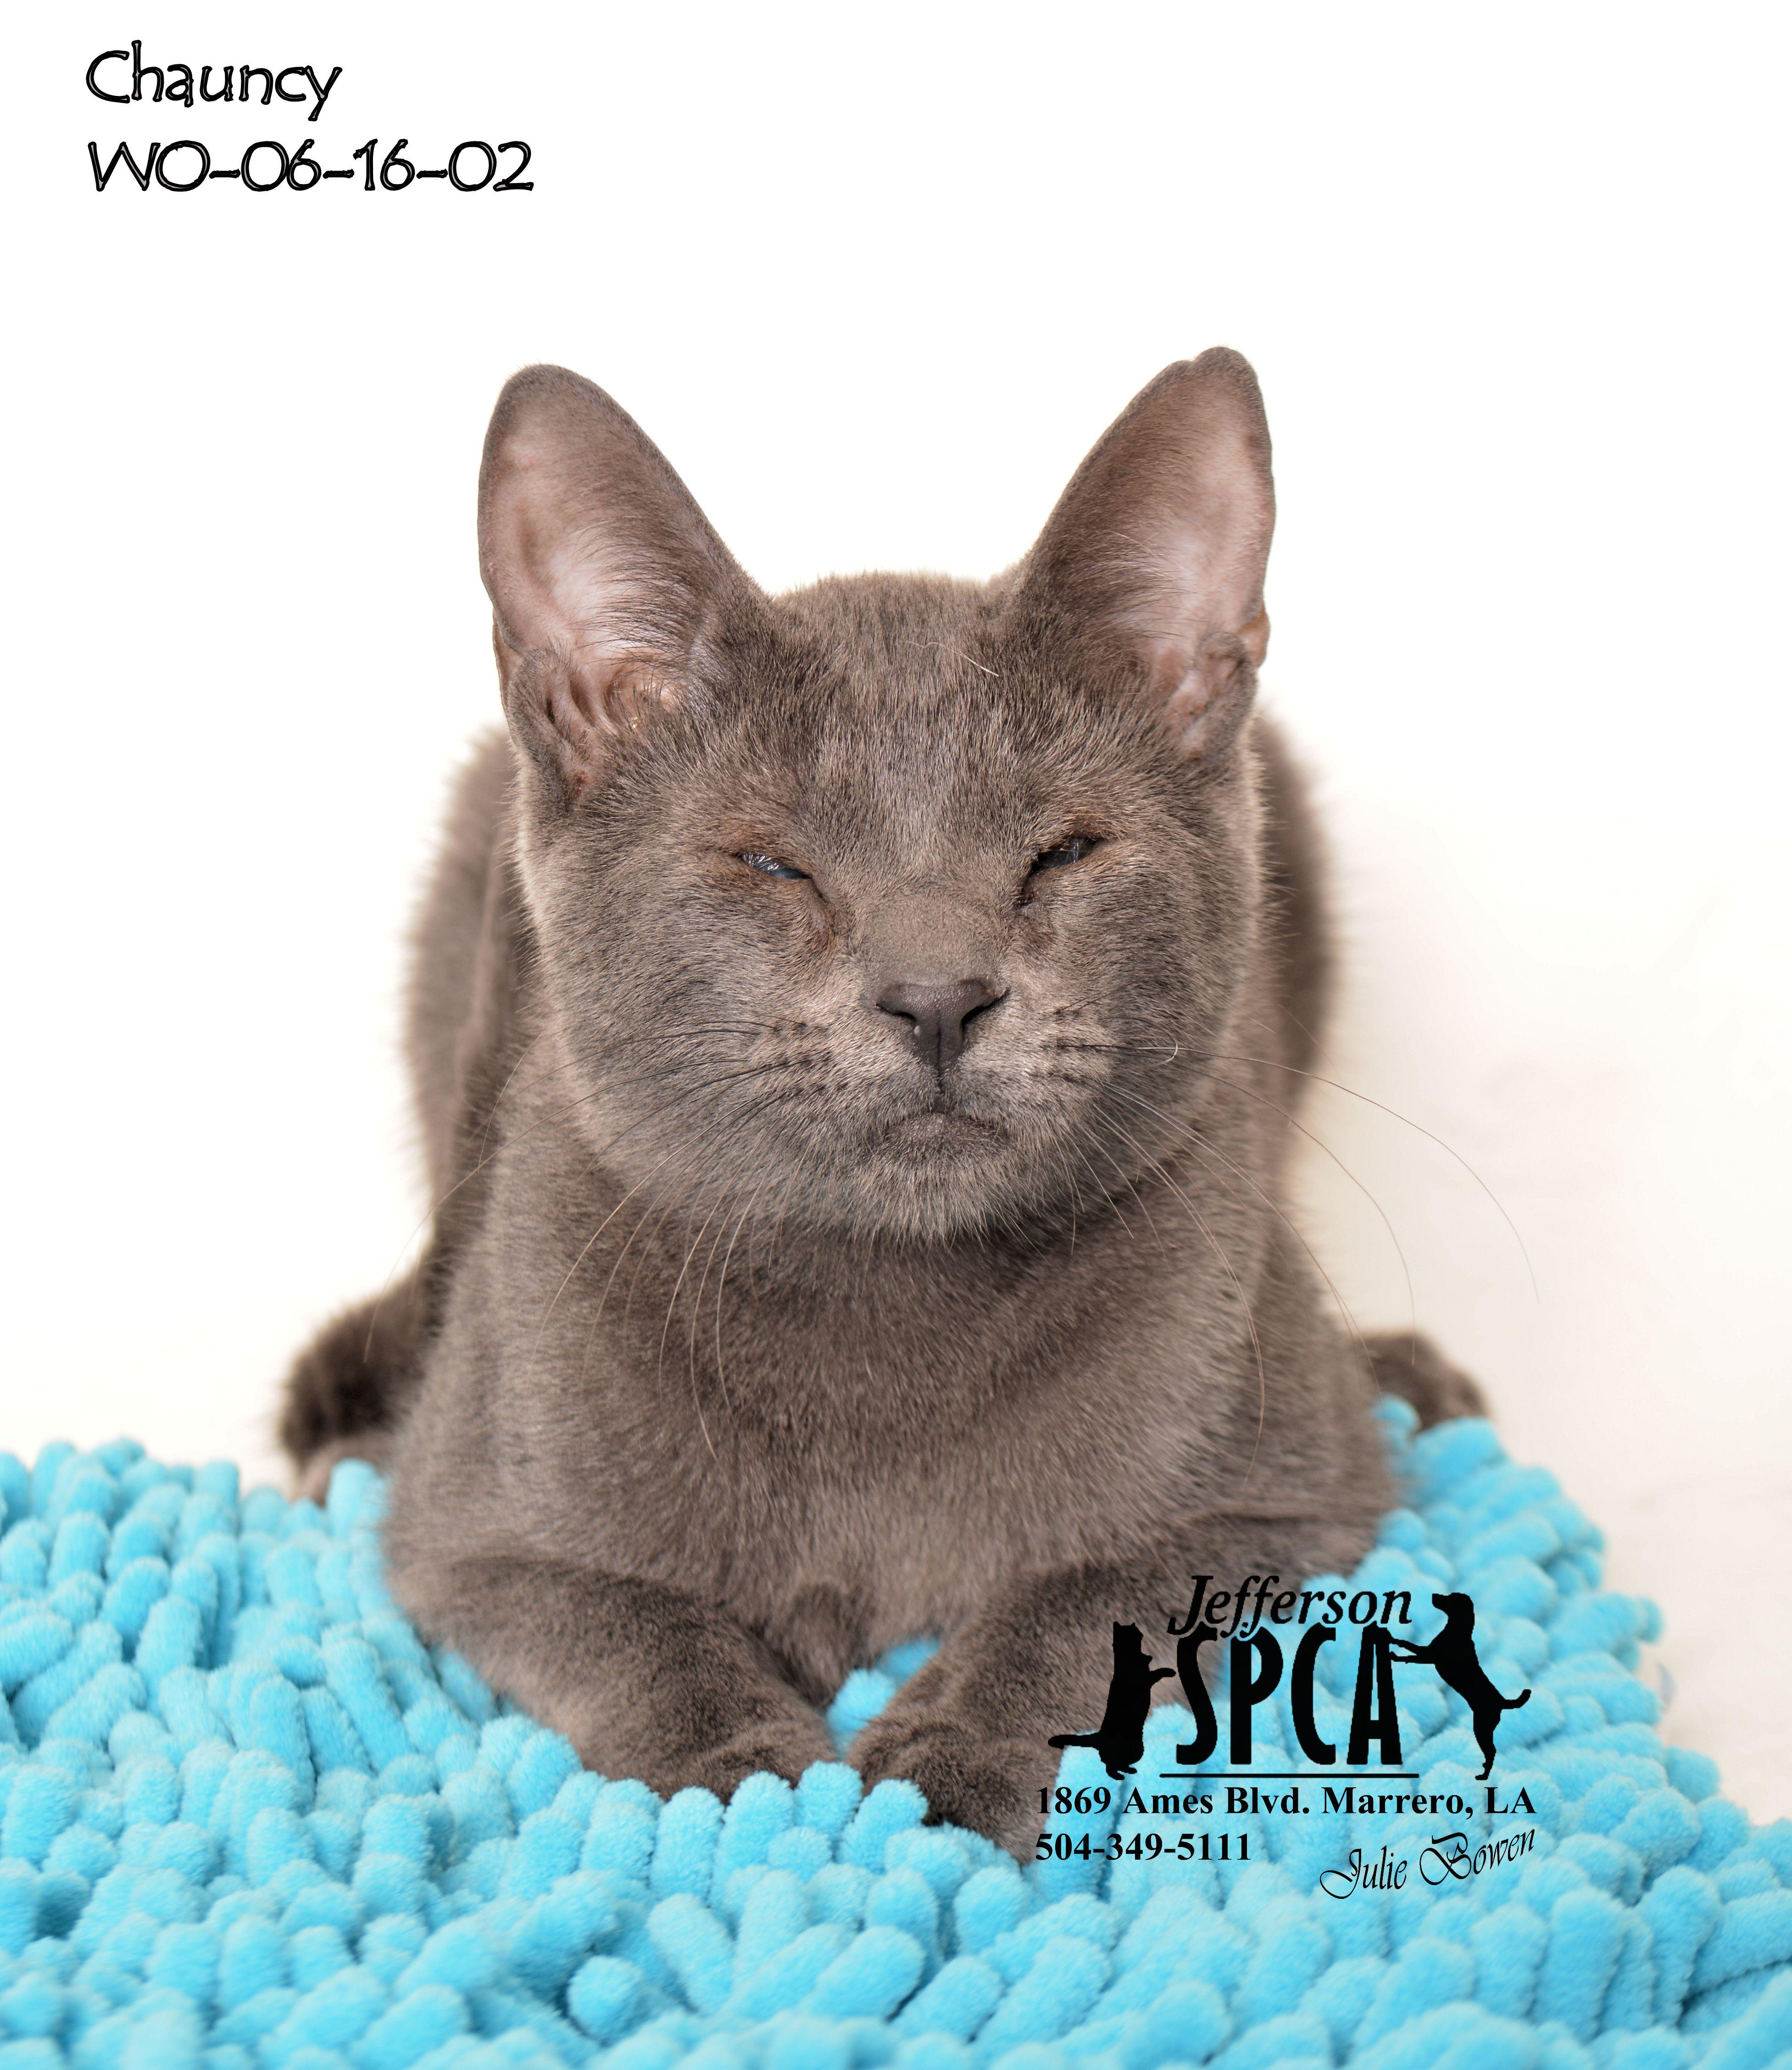 Cat for Adoption – Chauncy In a Foster Home near Marrero LA